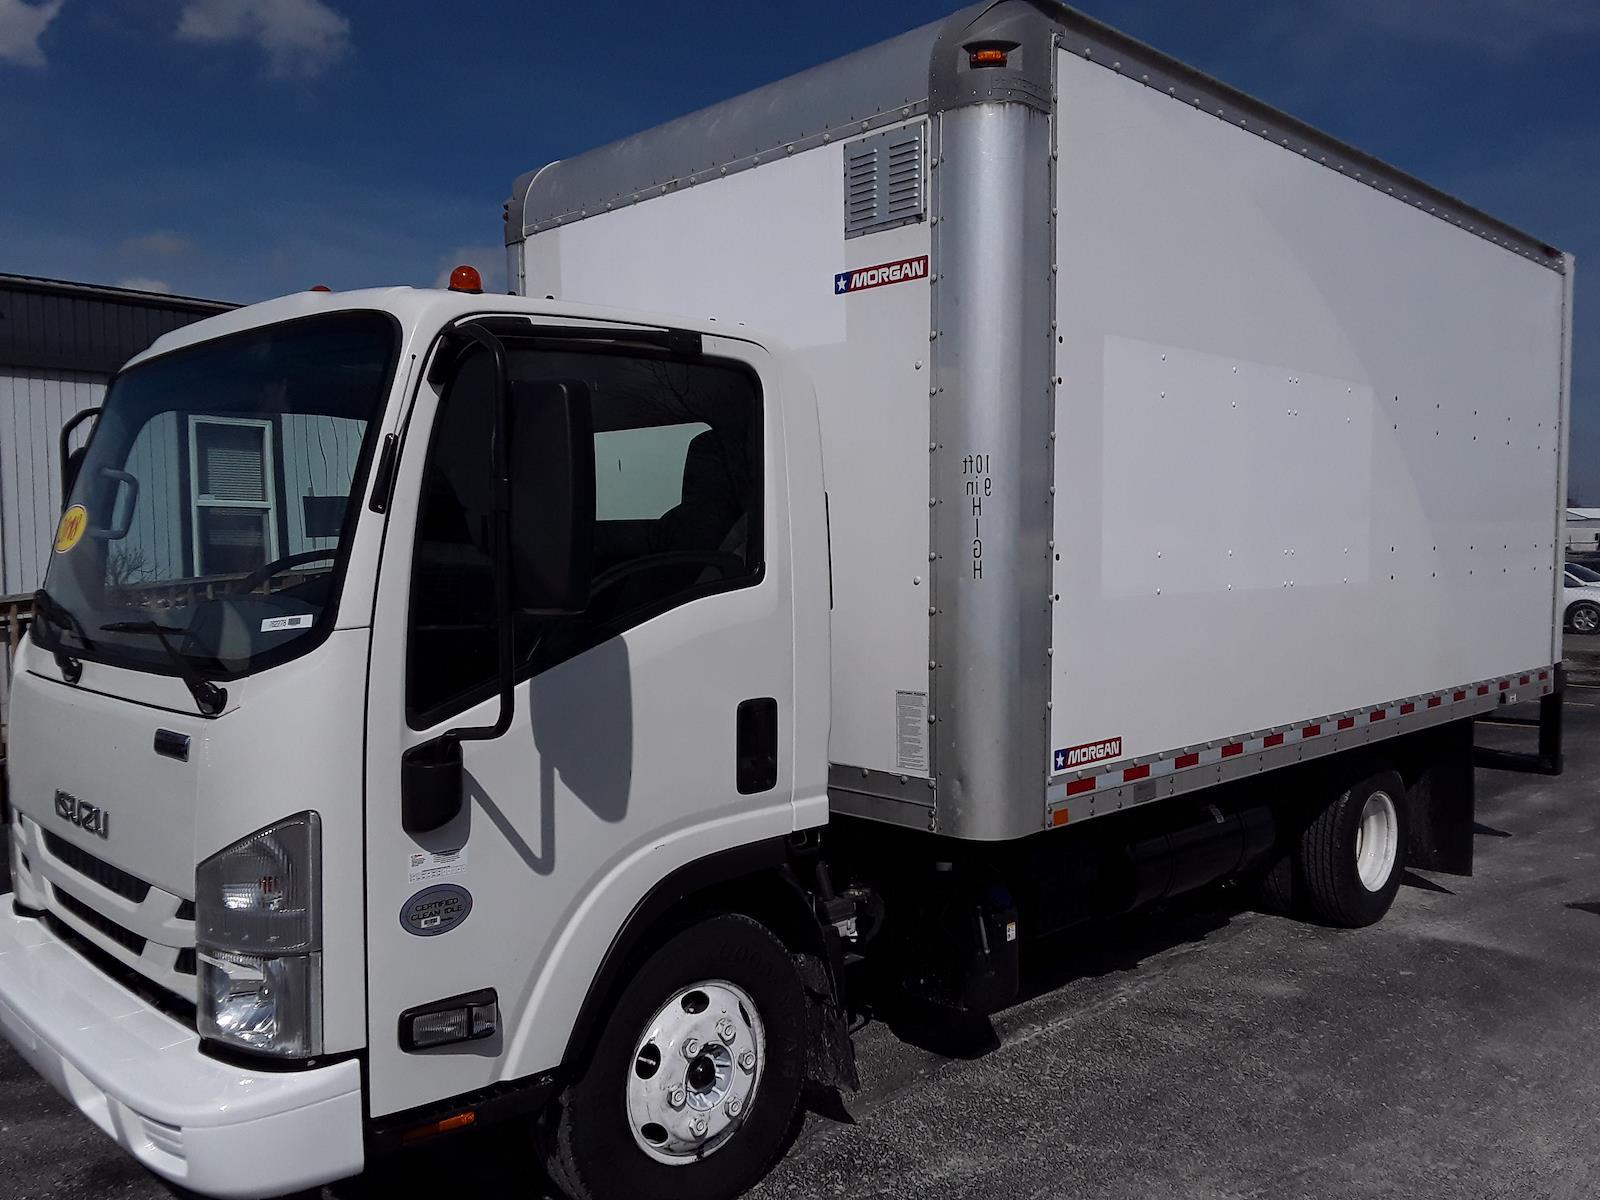 2018 Isuzu NPR-HD Regular Cab 4x2, Dry Freight #762278 - photo 1